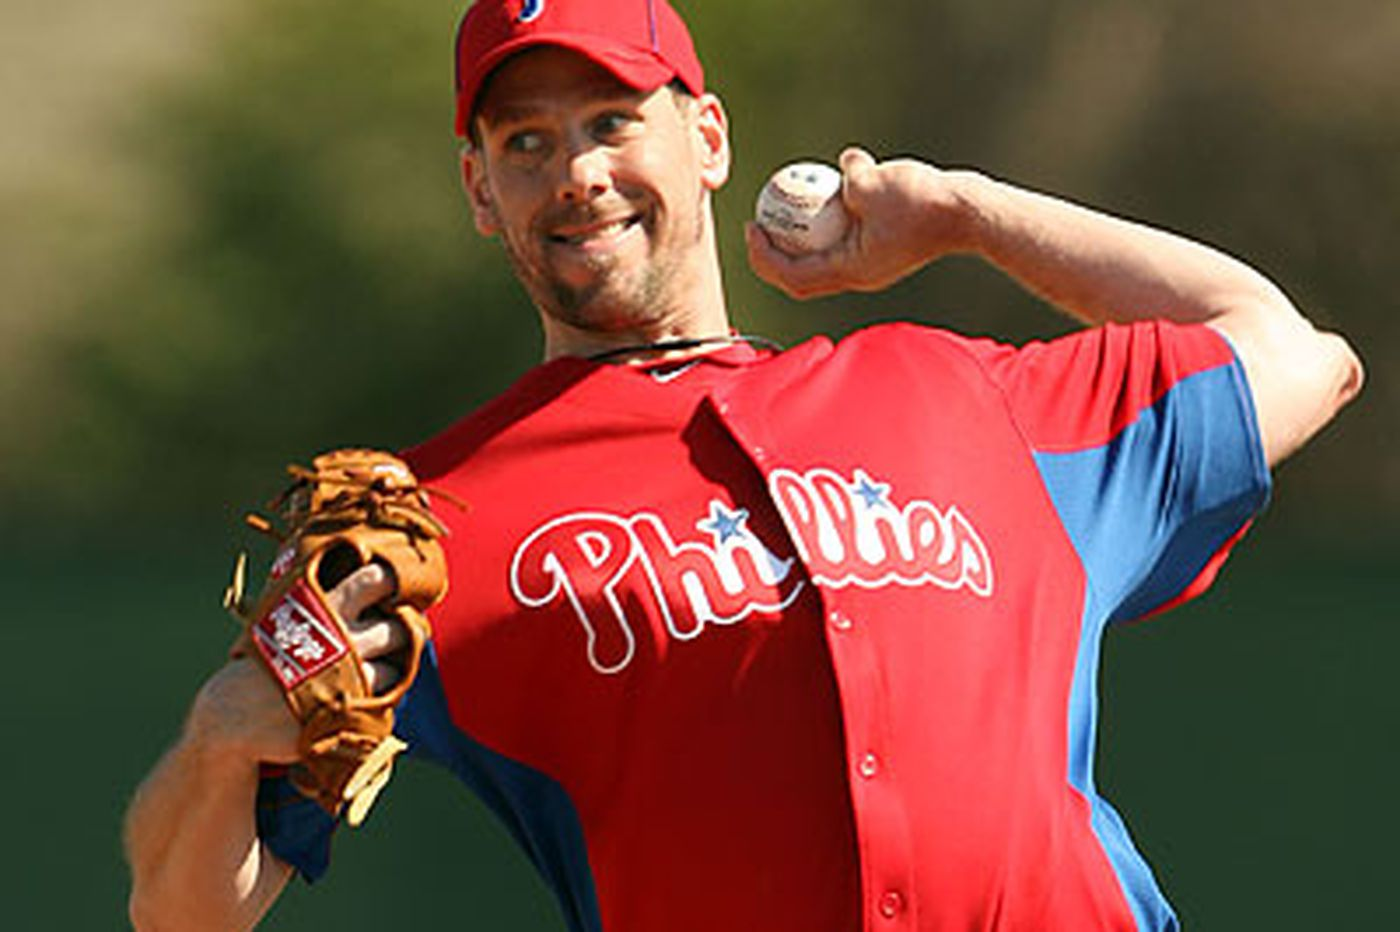 Phillies' Cliff Lee puts faith in simple training routine